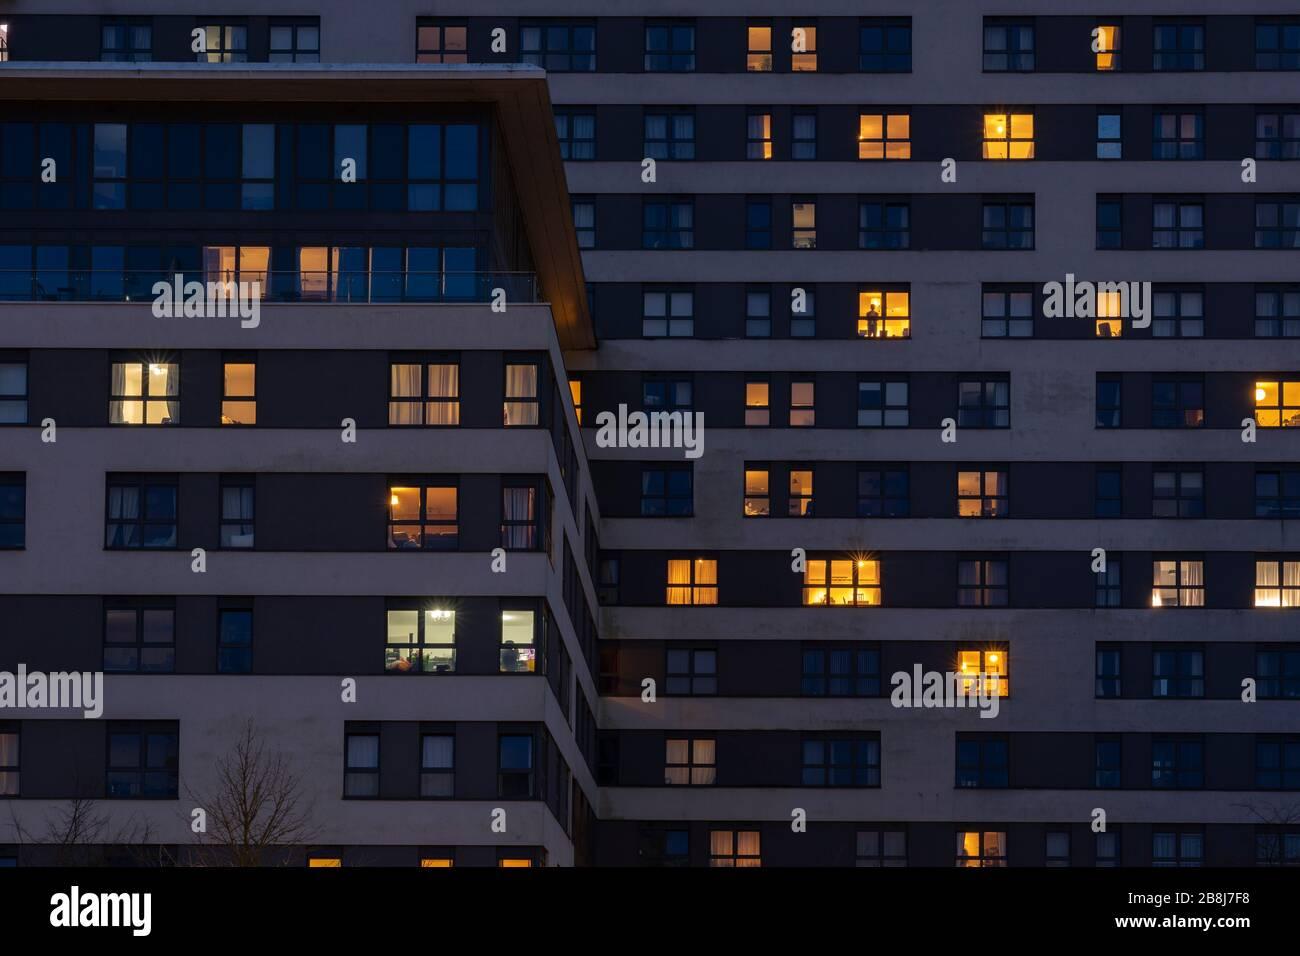 illuminated-flats-at-night-in-skyline-pl